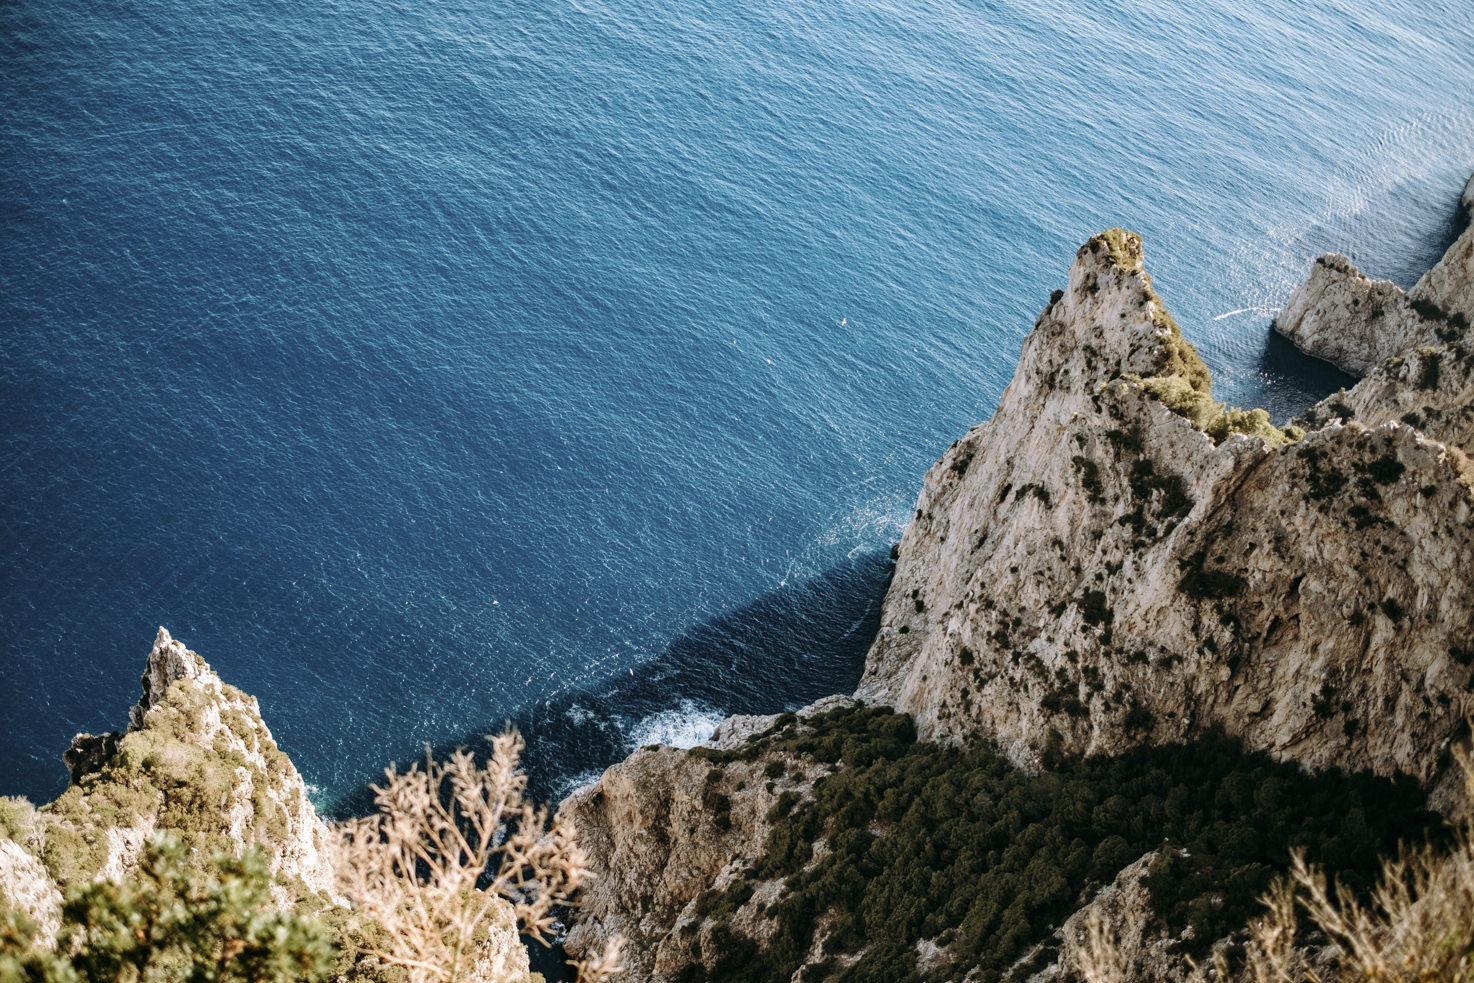 The cliffs of Capri